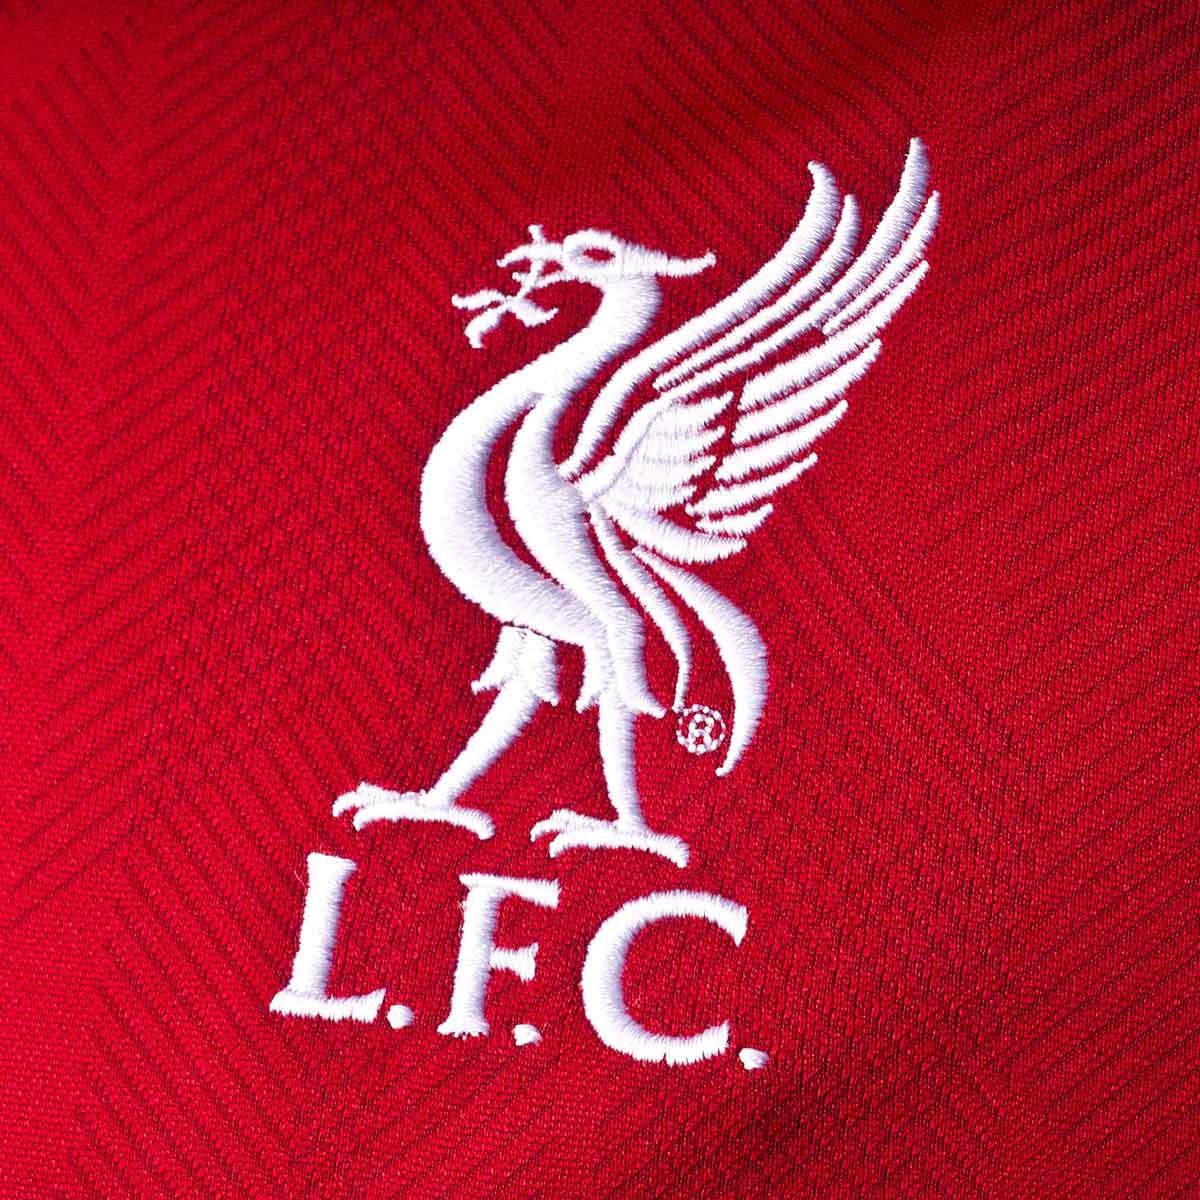 fa056d1be67 Jersey New Balance Liverpool FC 2018-2019 Home RDP - Tienda de fútbol  Fútbol Emotion